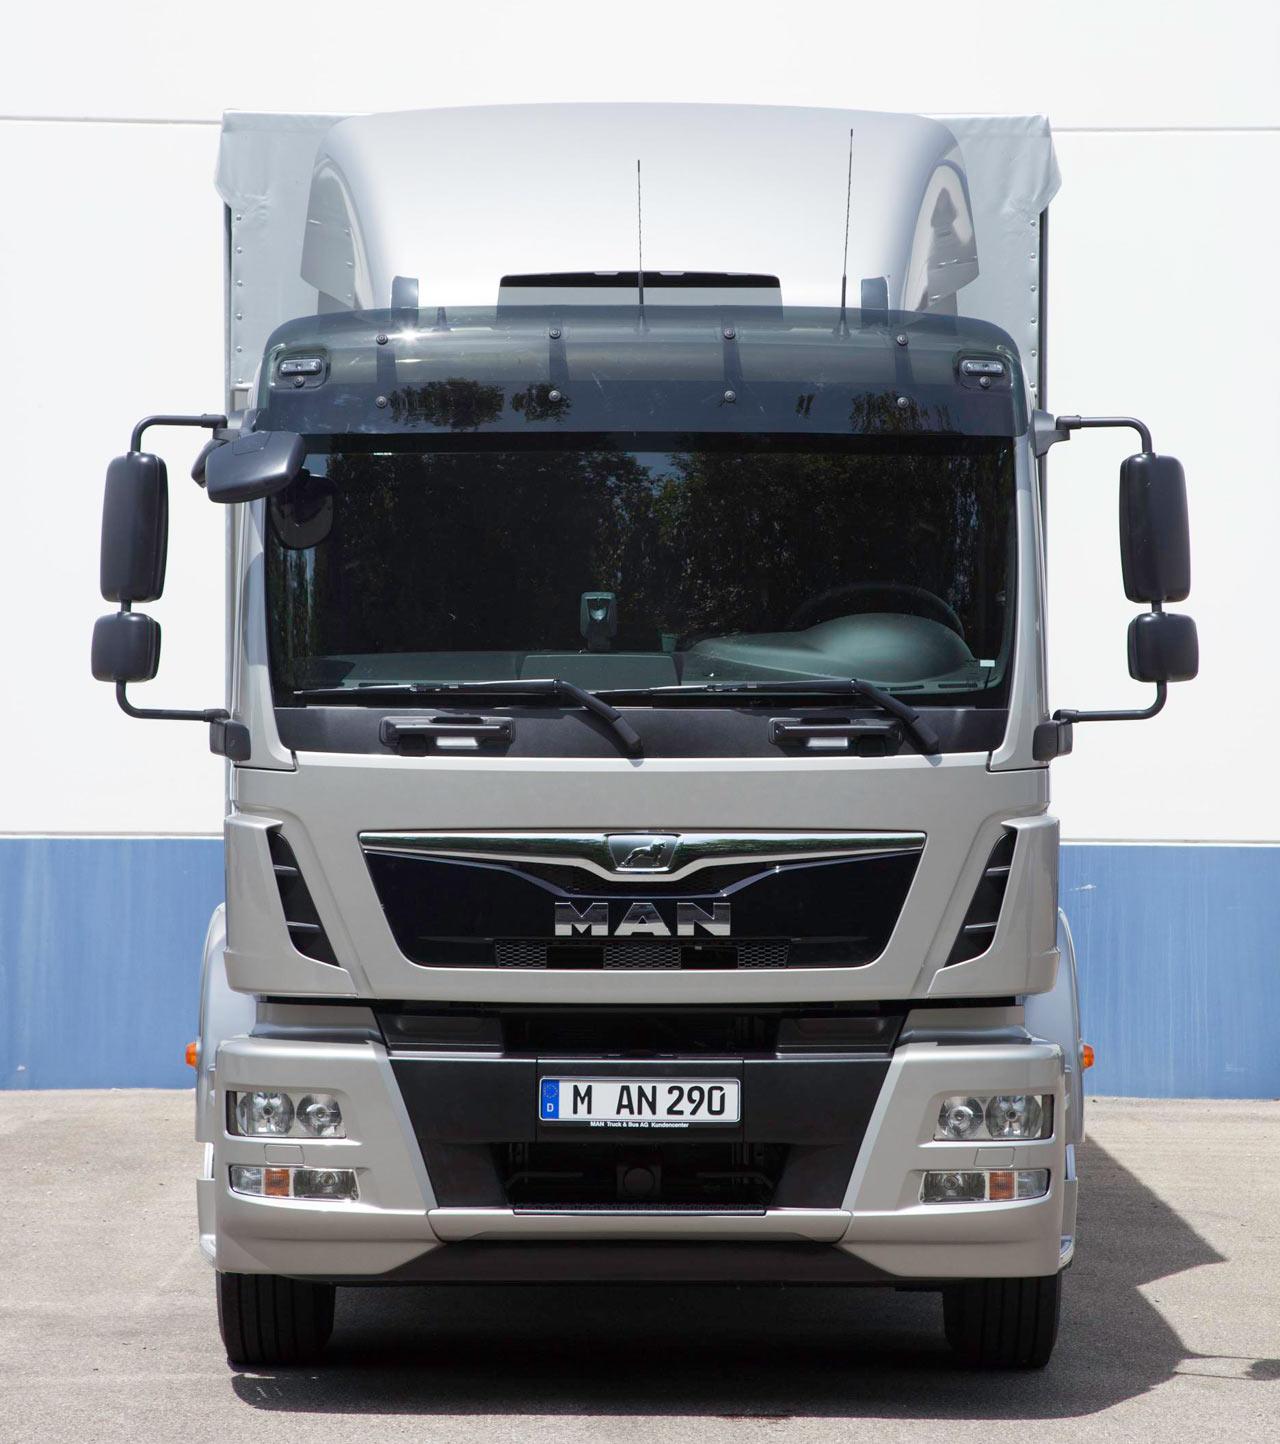 man tgm iii commercial vehicles trucksplanet. Black Bedroom Furniture Sets. Home Design Ideas